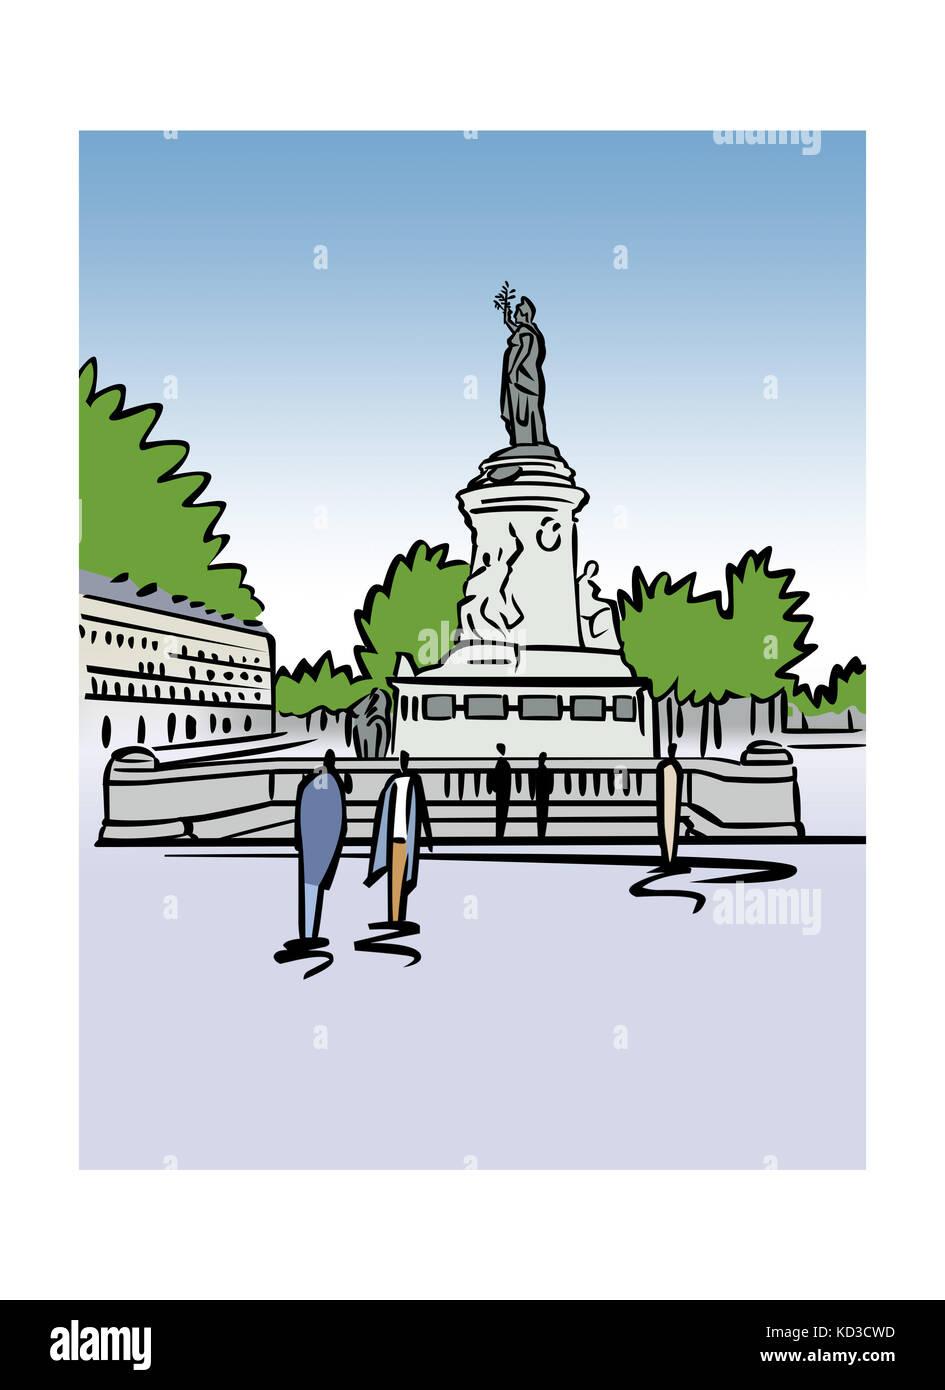 Abbildung: Place de la Republique in Paris, Frankreich Stockfoto